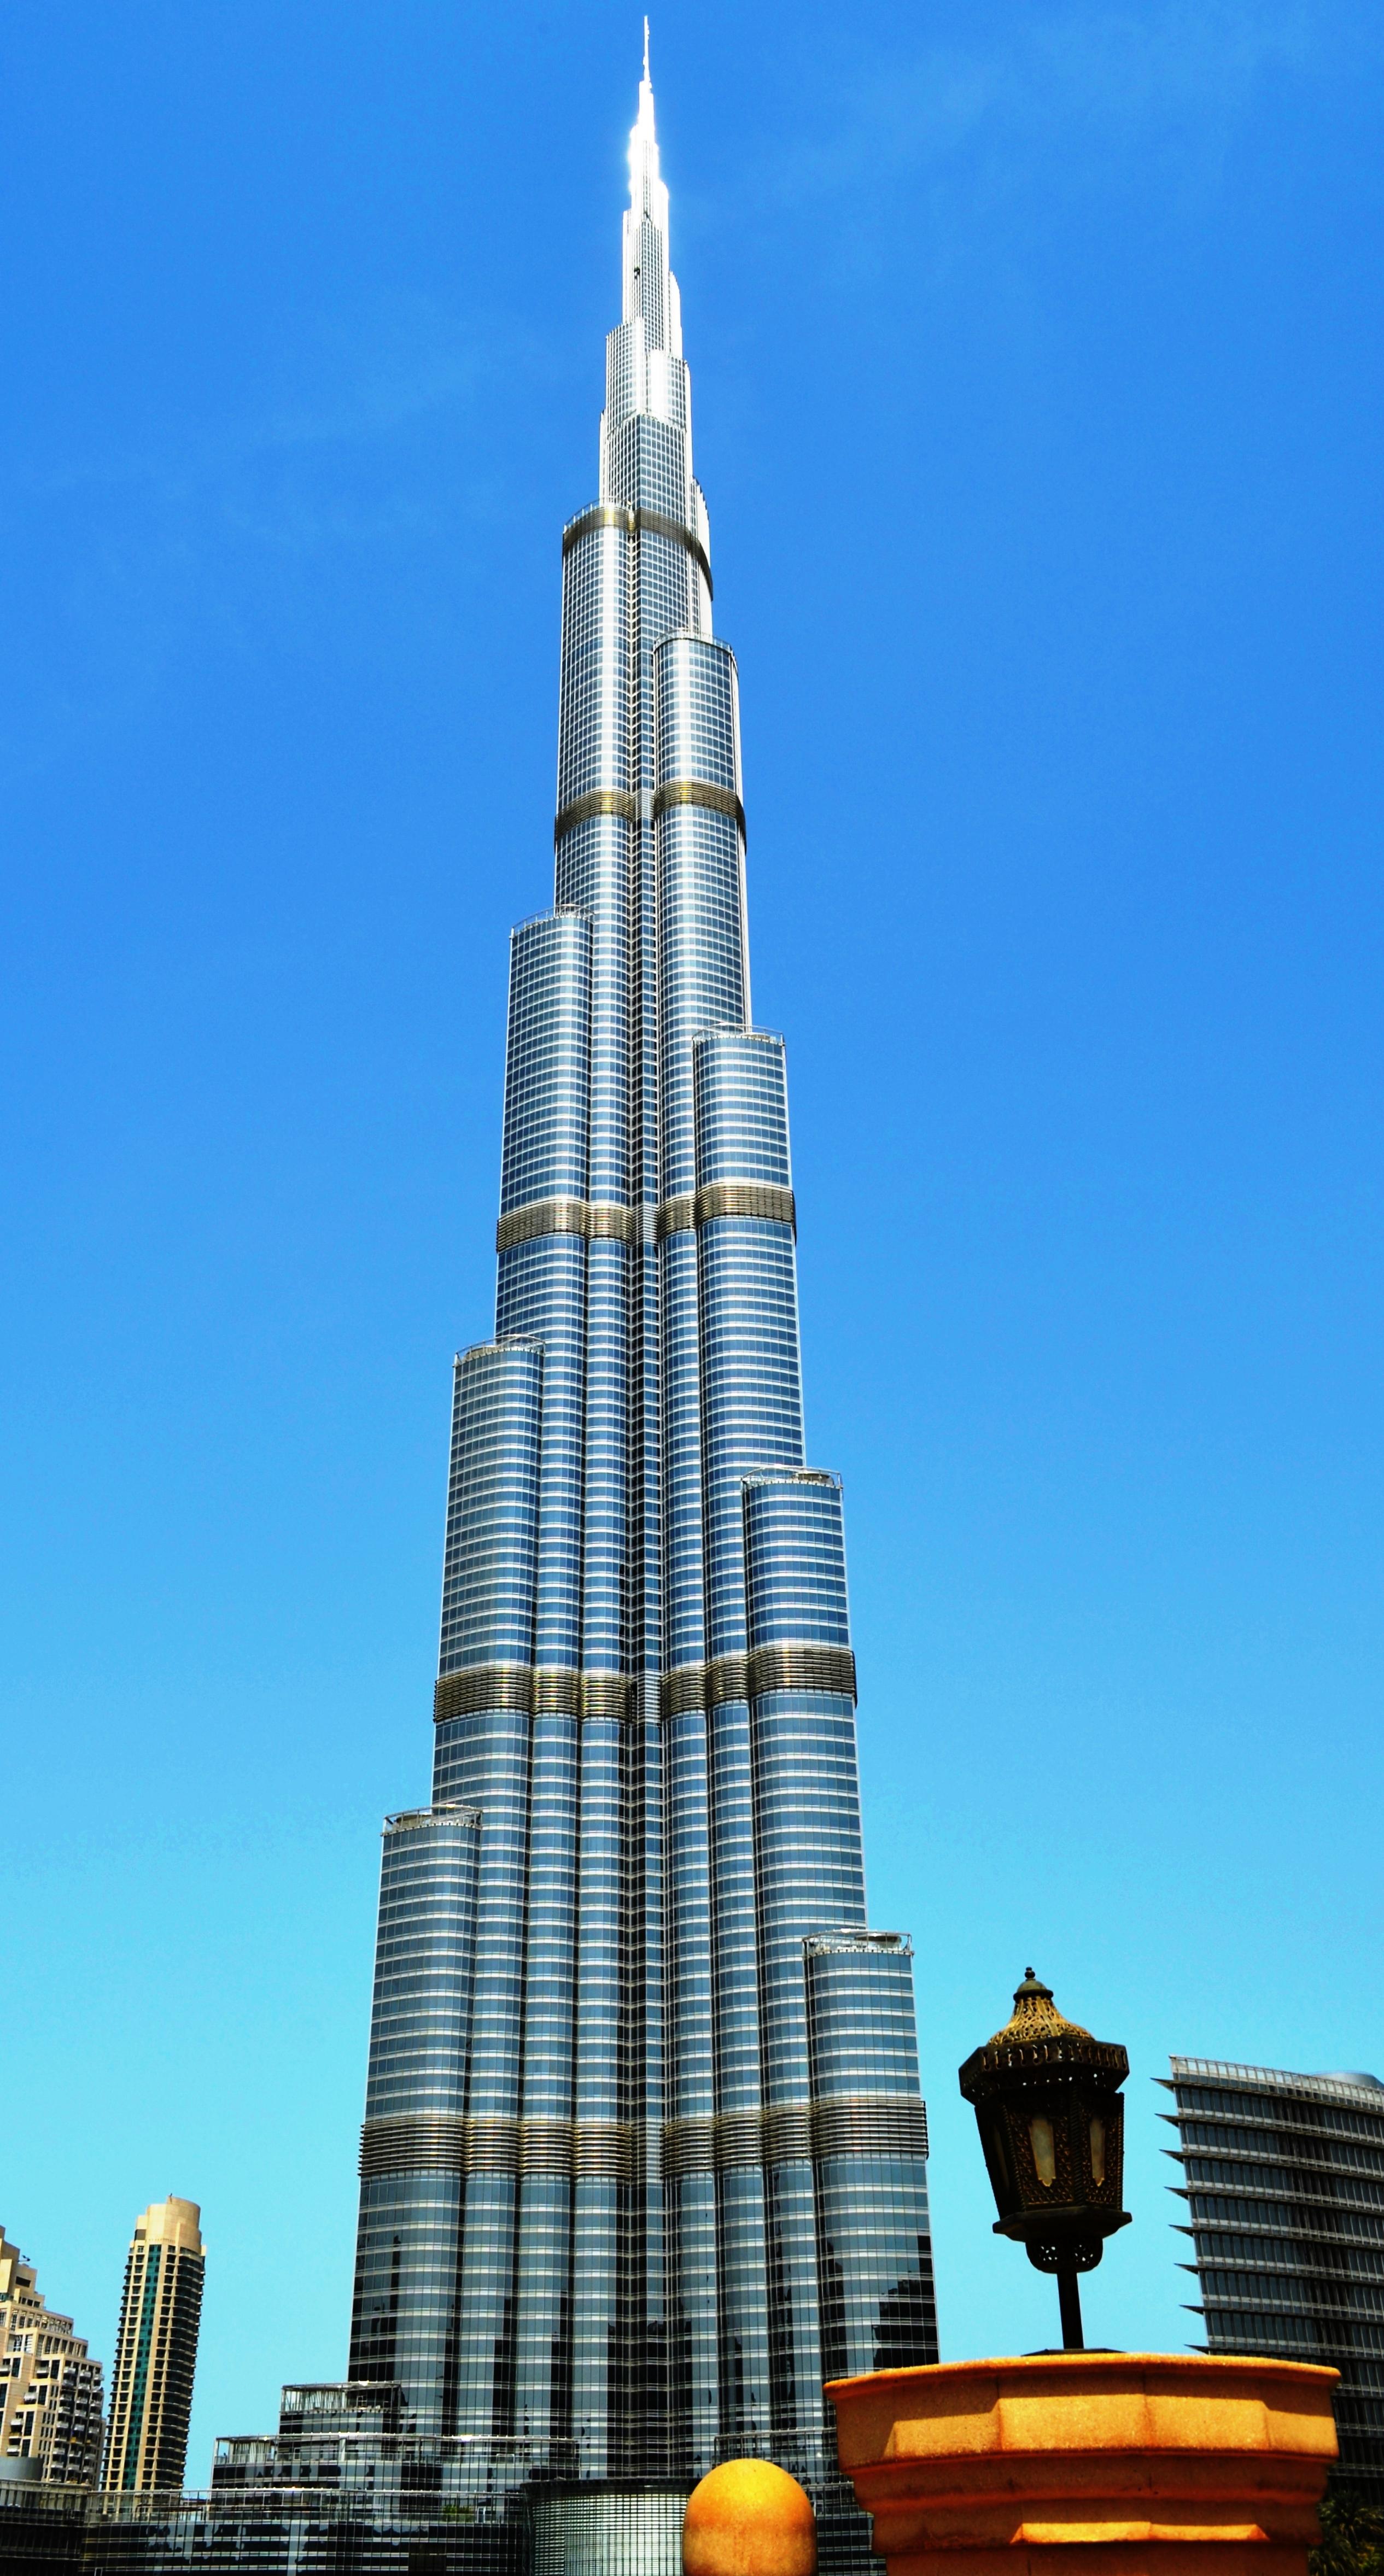 Download burj khalifa dubai 25314712 121263 hd wallpaper res 2531x4712 2531x4712 45 burj - Dubai burj khalifa hd photos ...